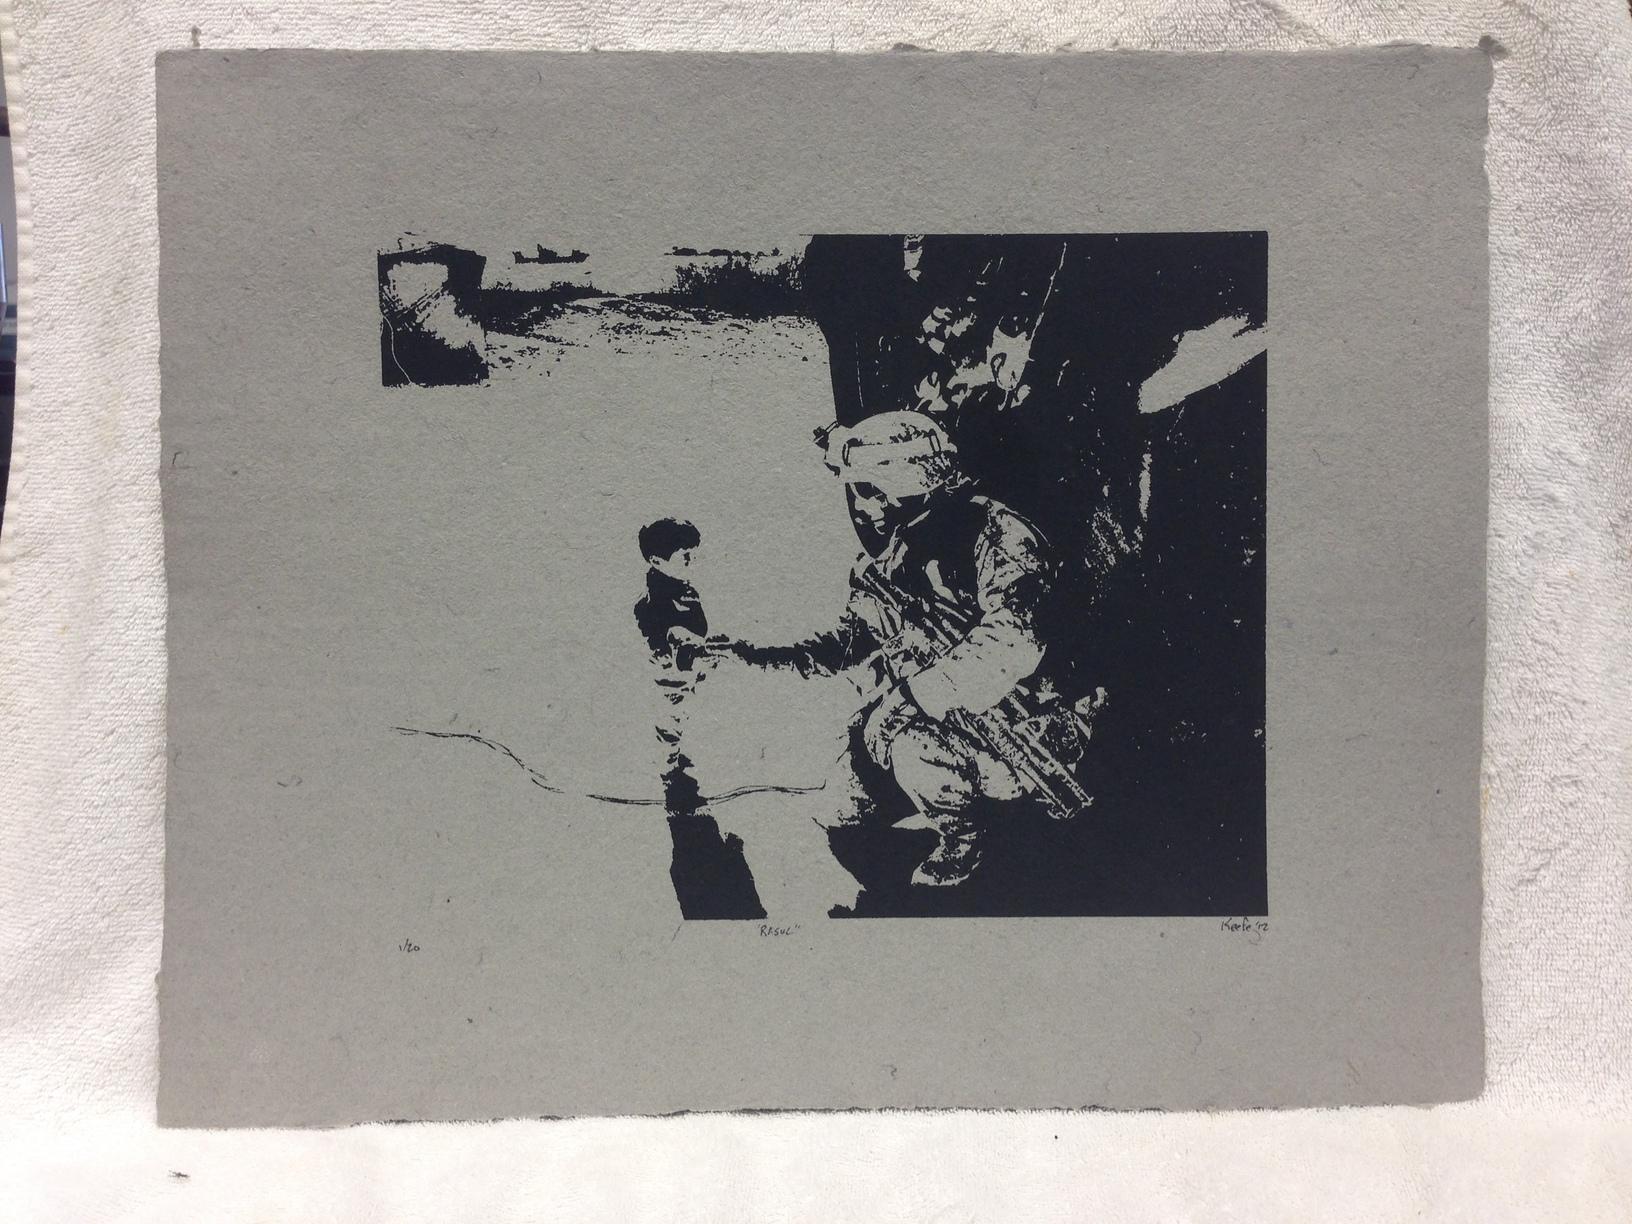 David Keefe Marines - Iraq _Rasul_ 2012 Silkscreen on Handmade Paper from military uniforms 16 x 20 PCNJ IMG_0959JPG.jpg